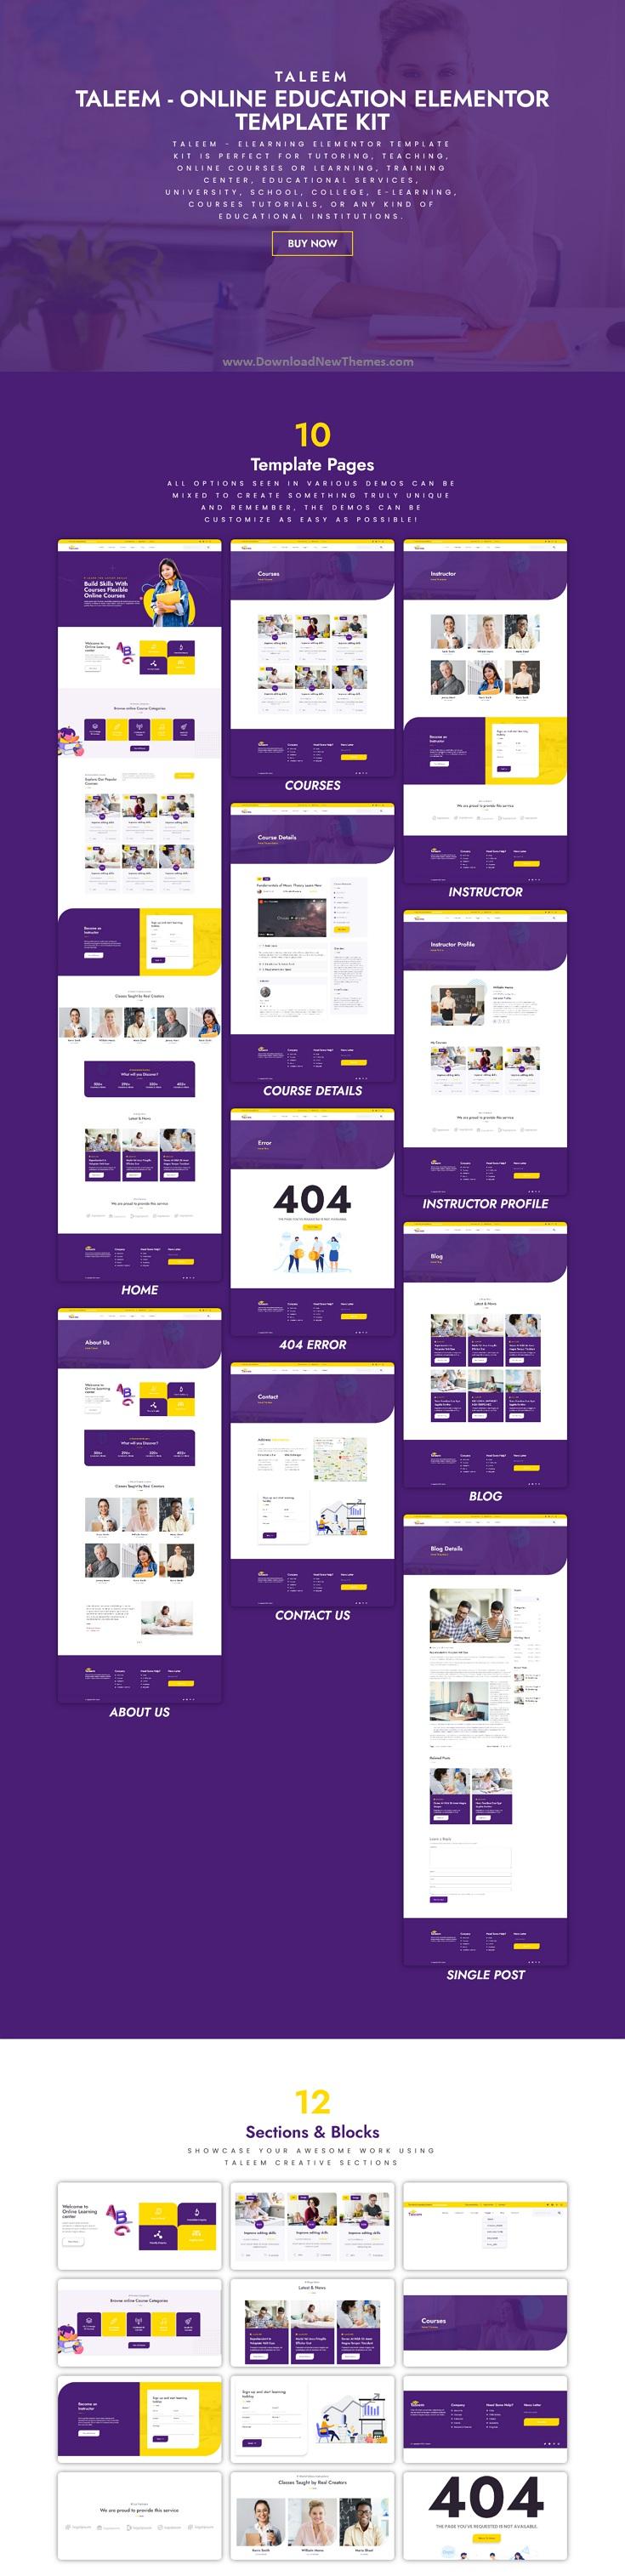 Taleem - Online Education Elementor Template Kit